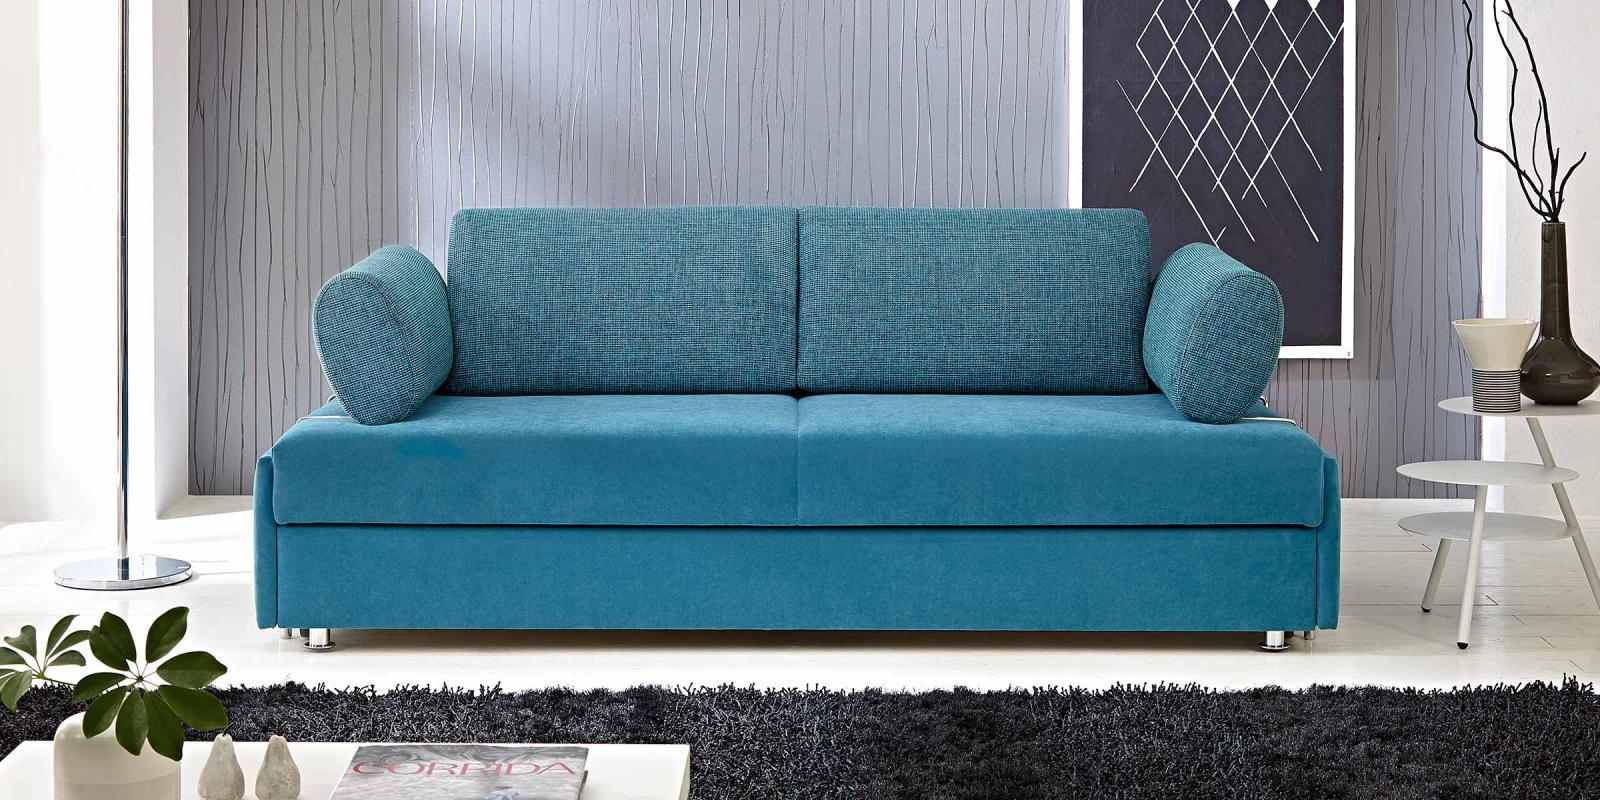 schlafsofa doppelbettsofa mit kaltschaumpolsterung zoom. Black Bedroom Furniture Sets. Home Design Ideas